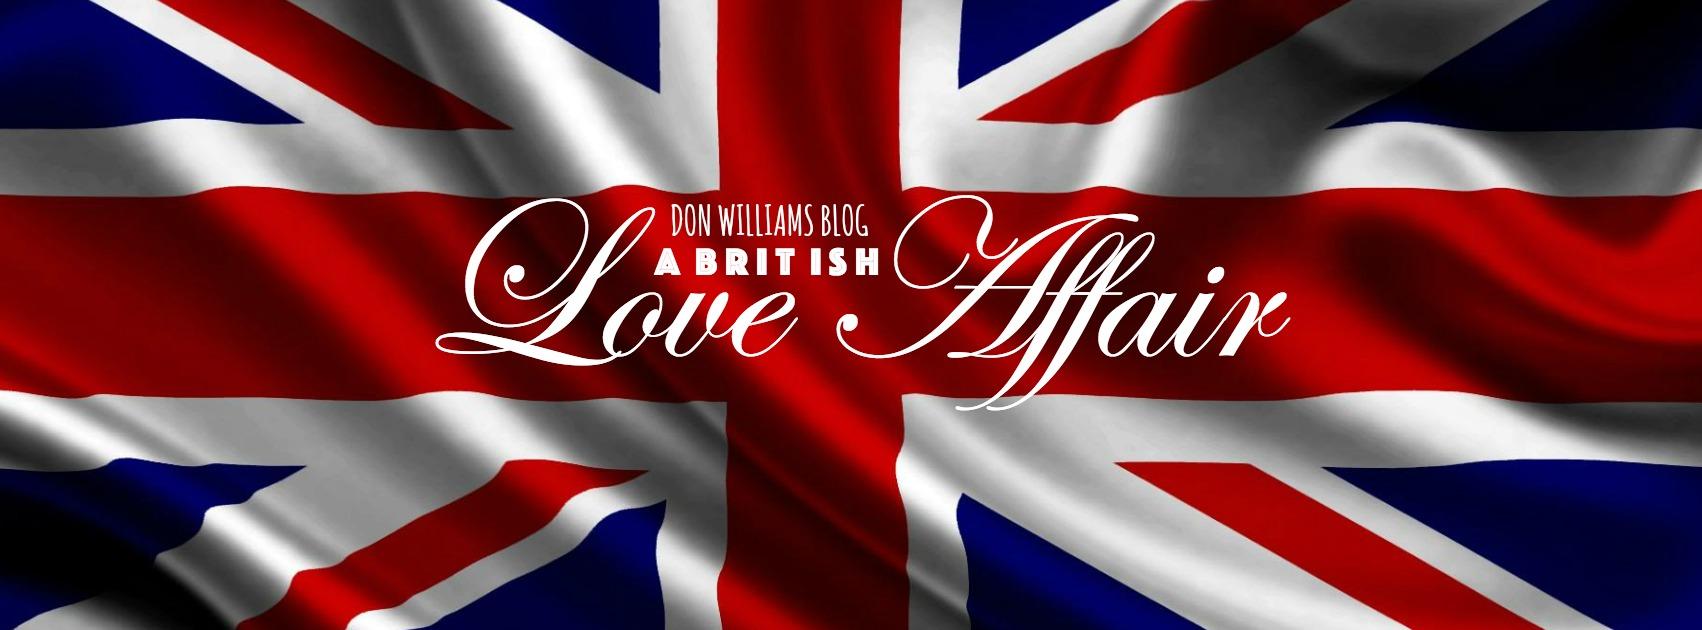 BRITISH BLOG.jpg